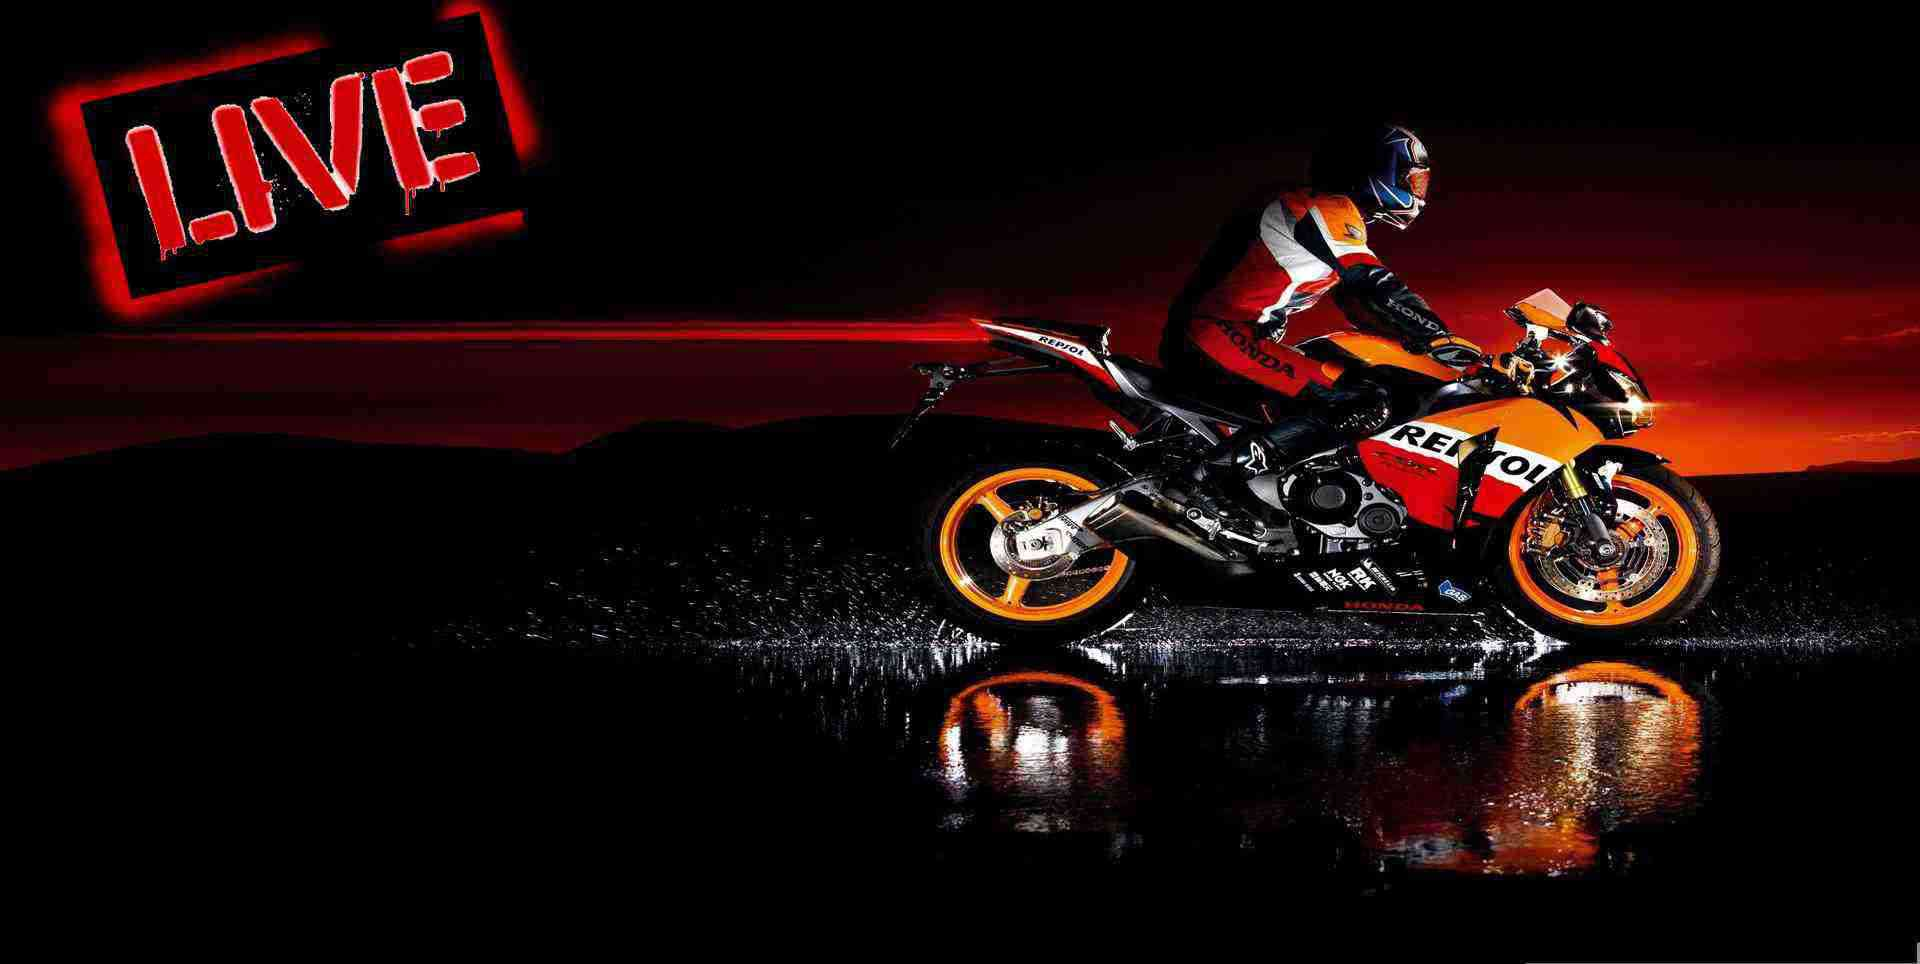 sepang-sbk-2015-race-live